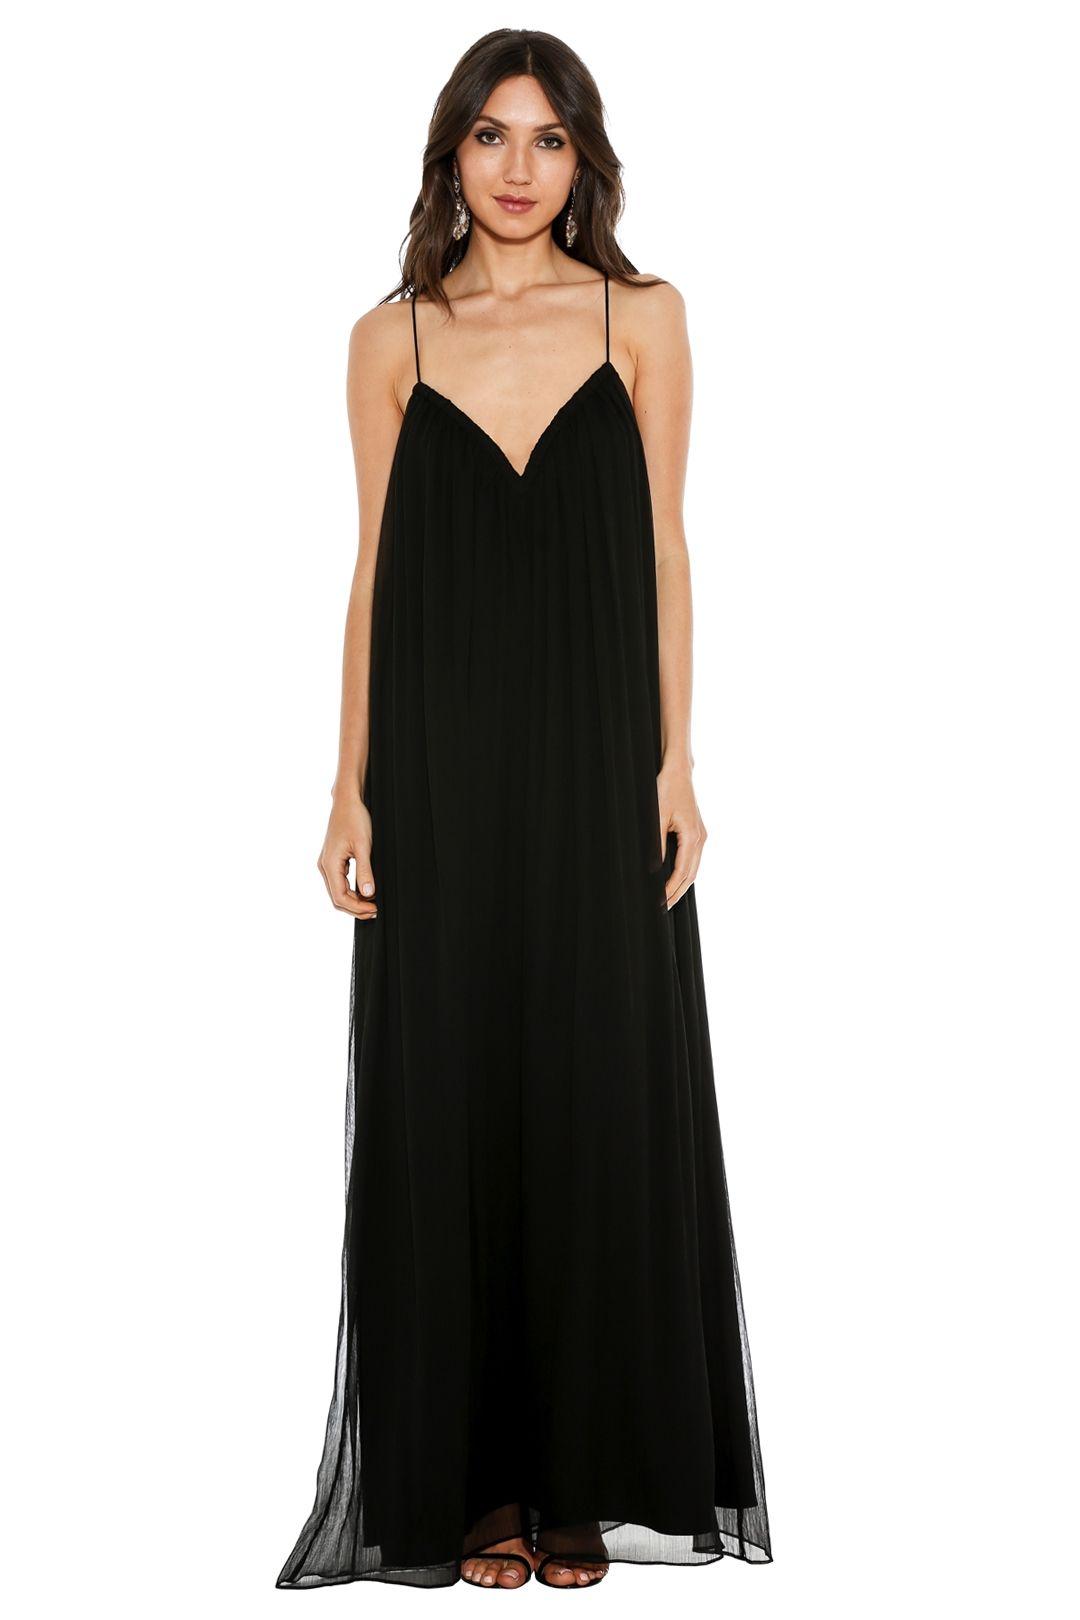 Camilla & Marc - Zendo Dress - Black - Front